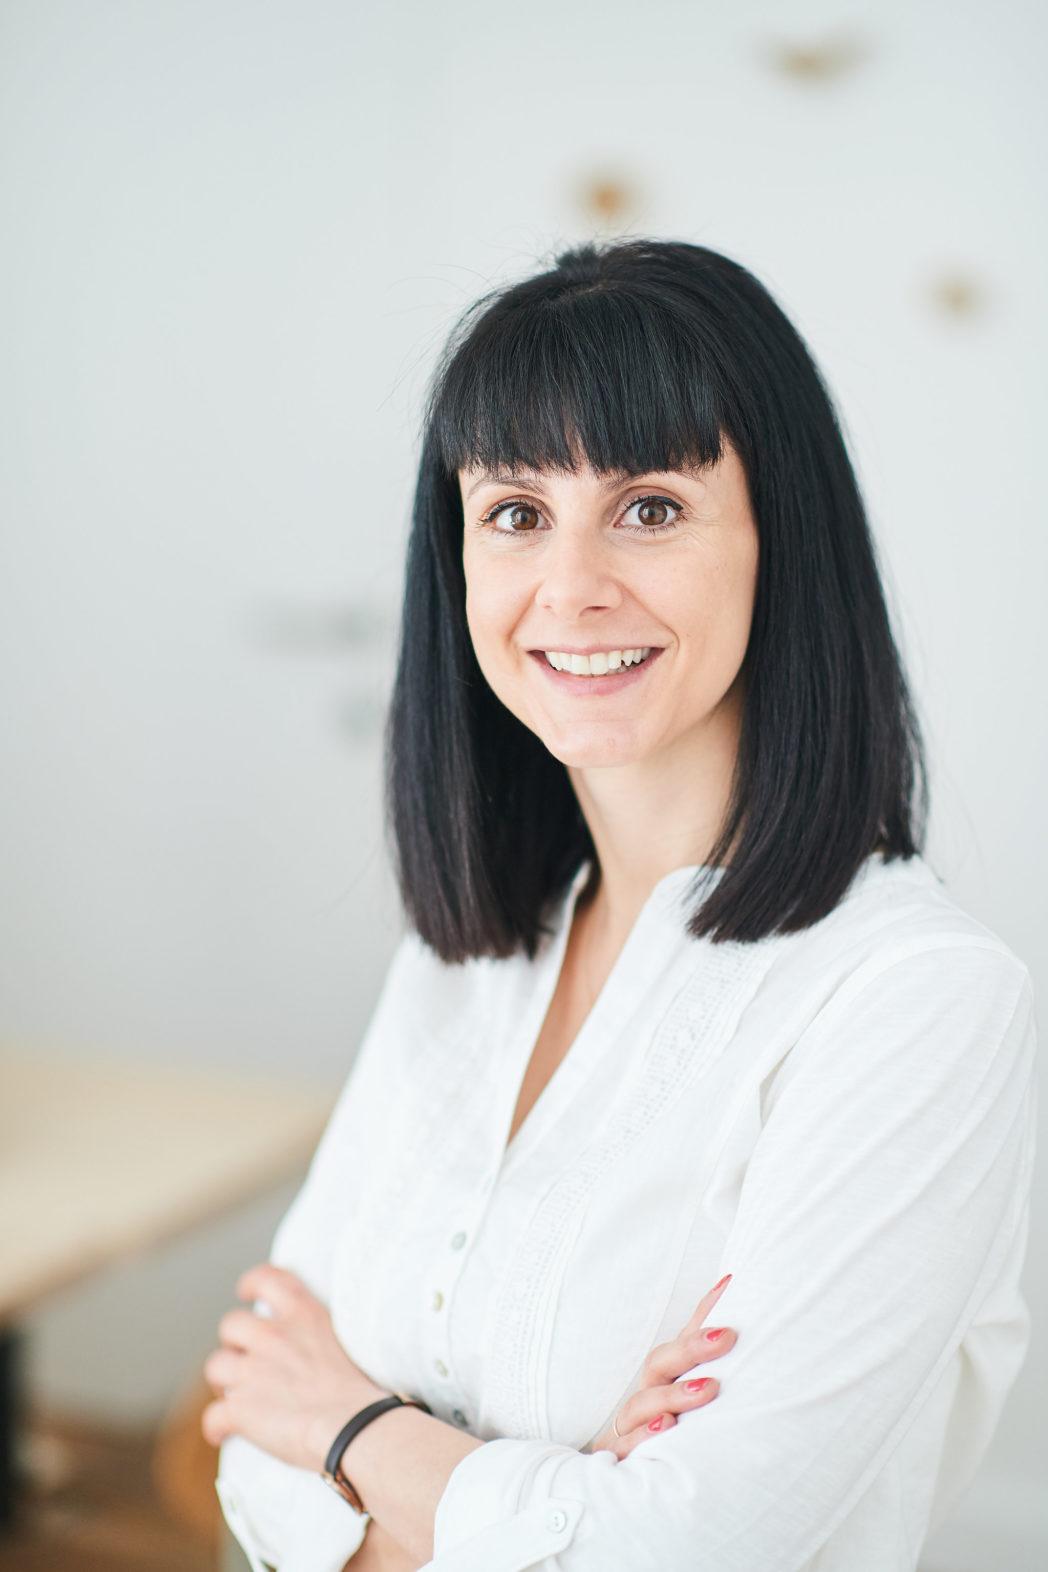 Myriam Kamouh